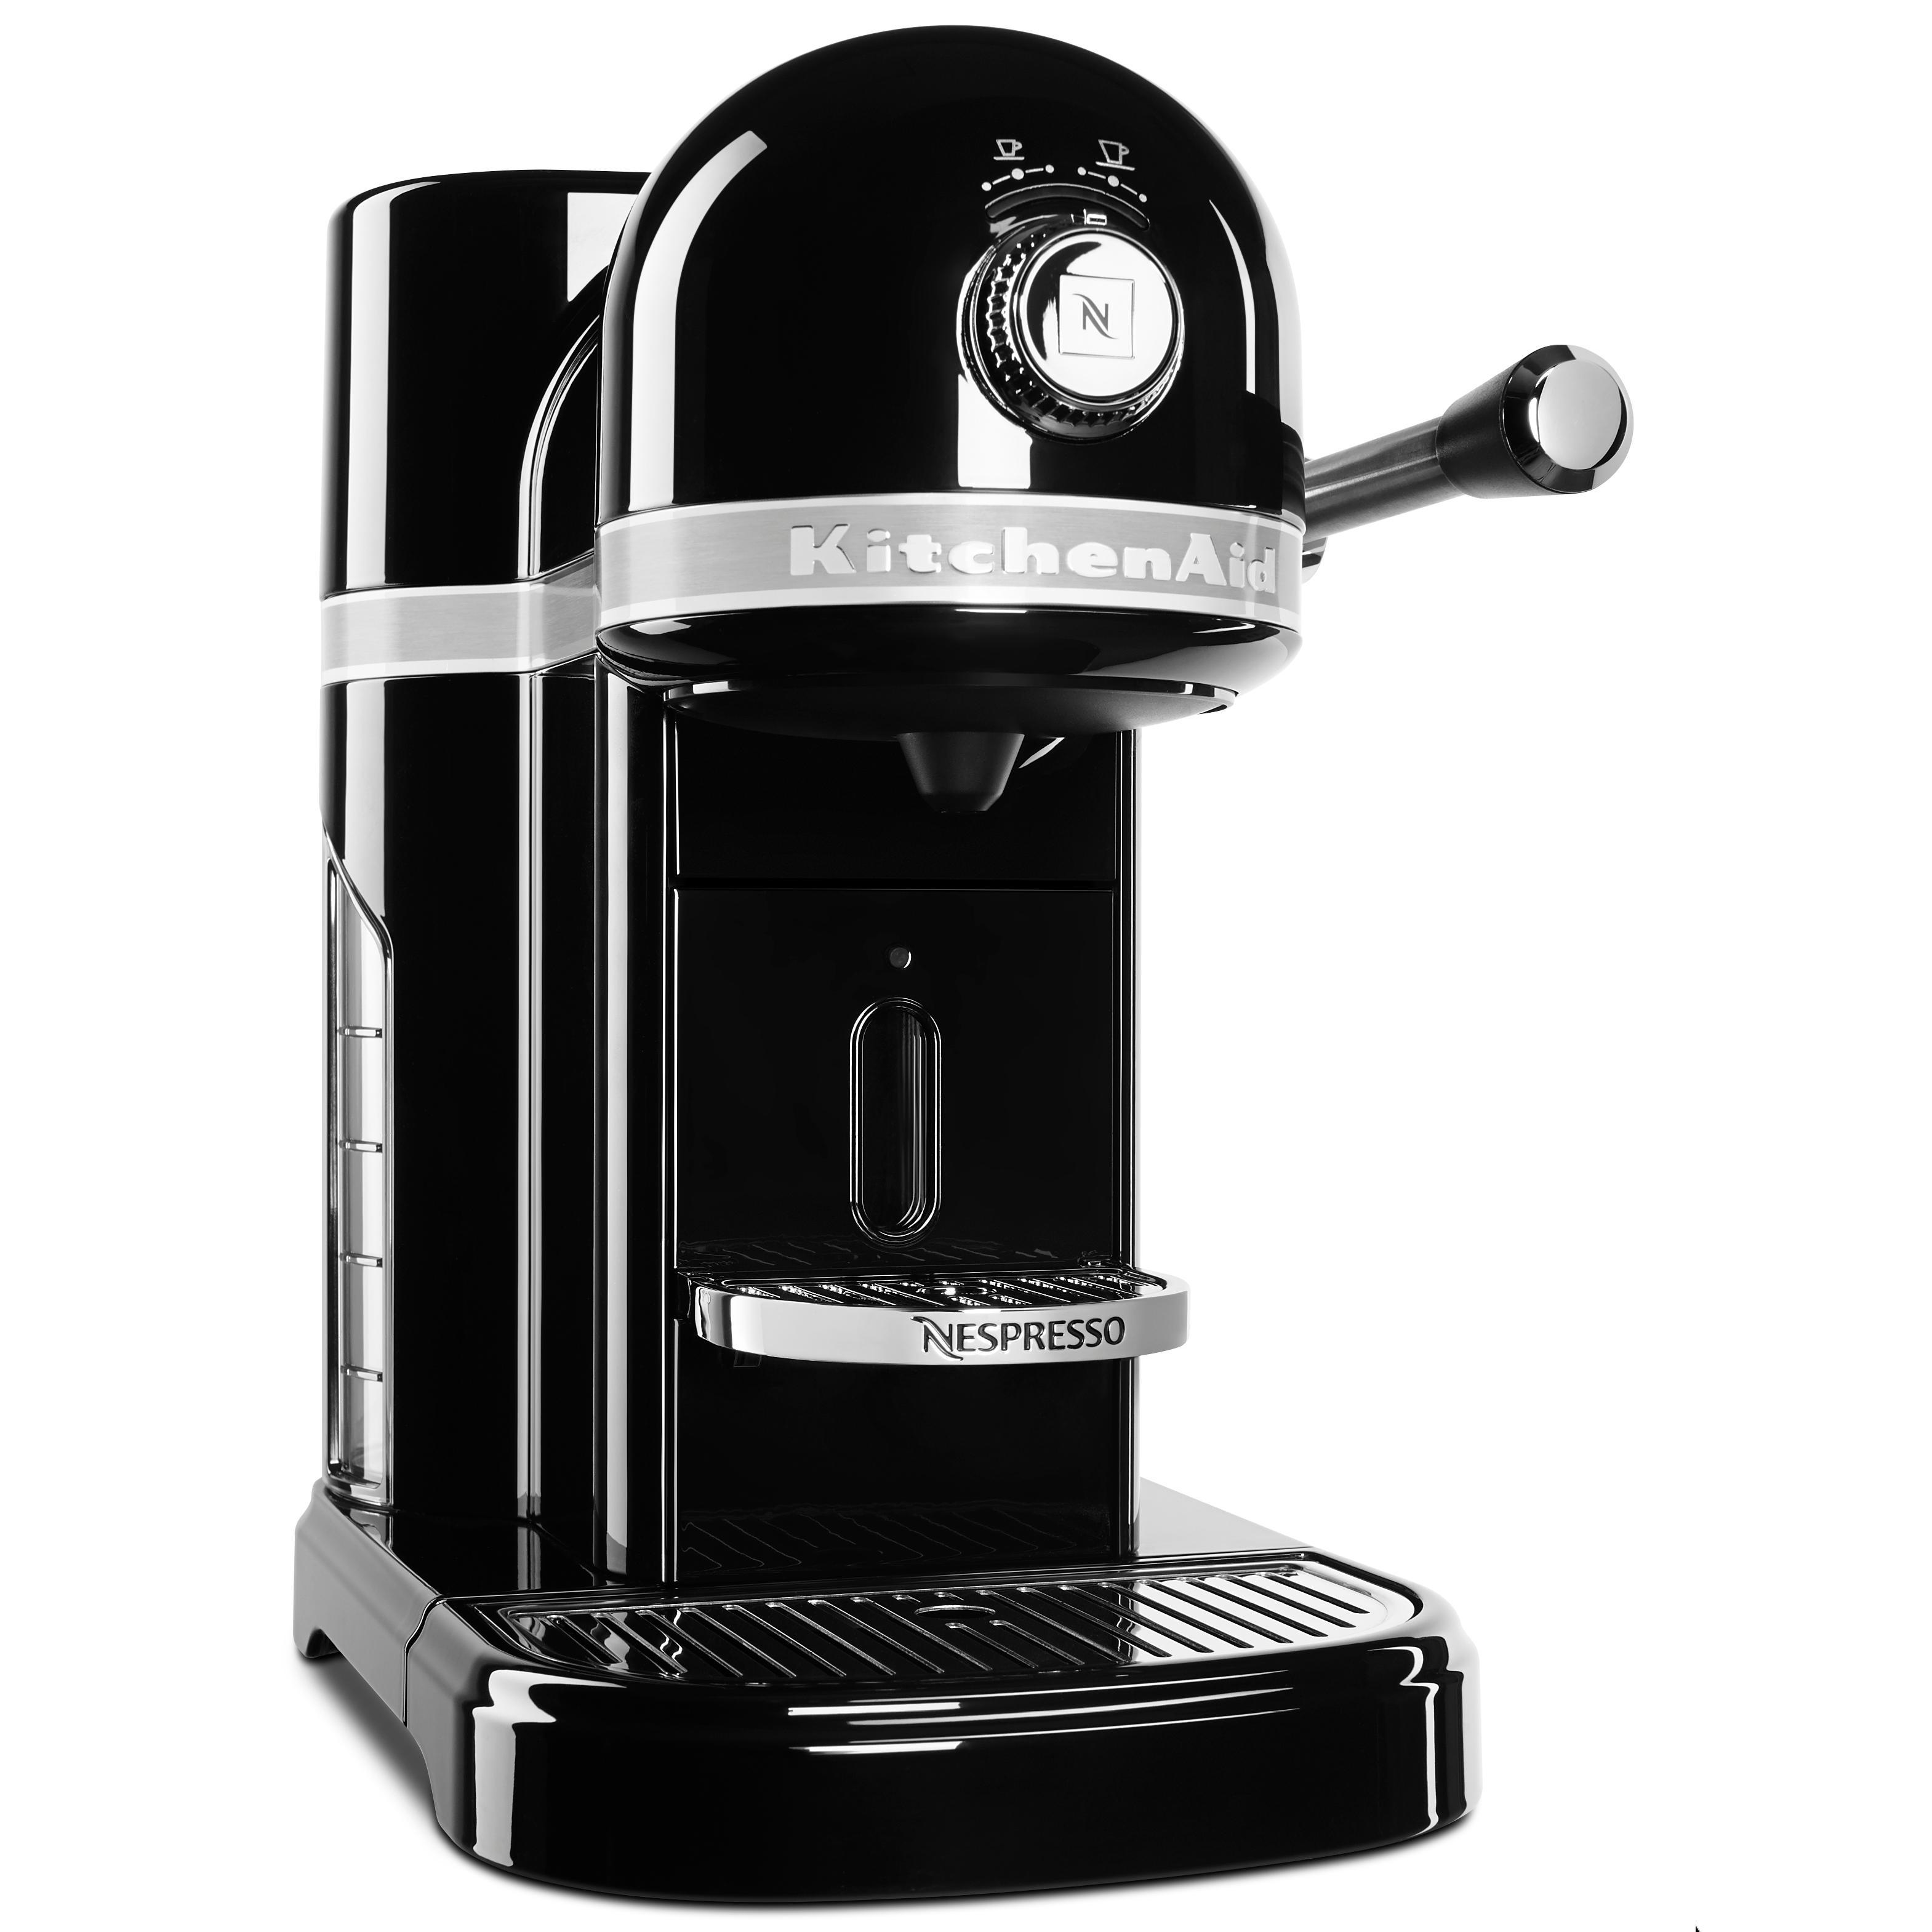 Amazon KitchenAid KES0503OB Nespresso yx Black Kitchen